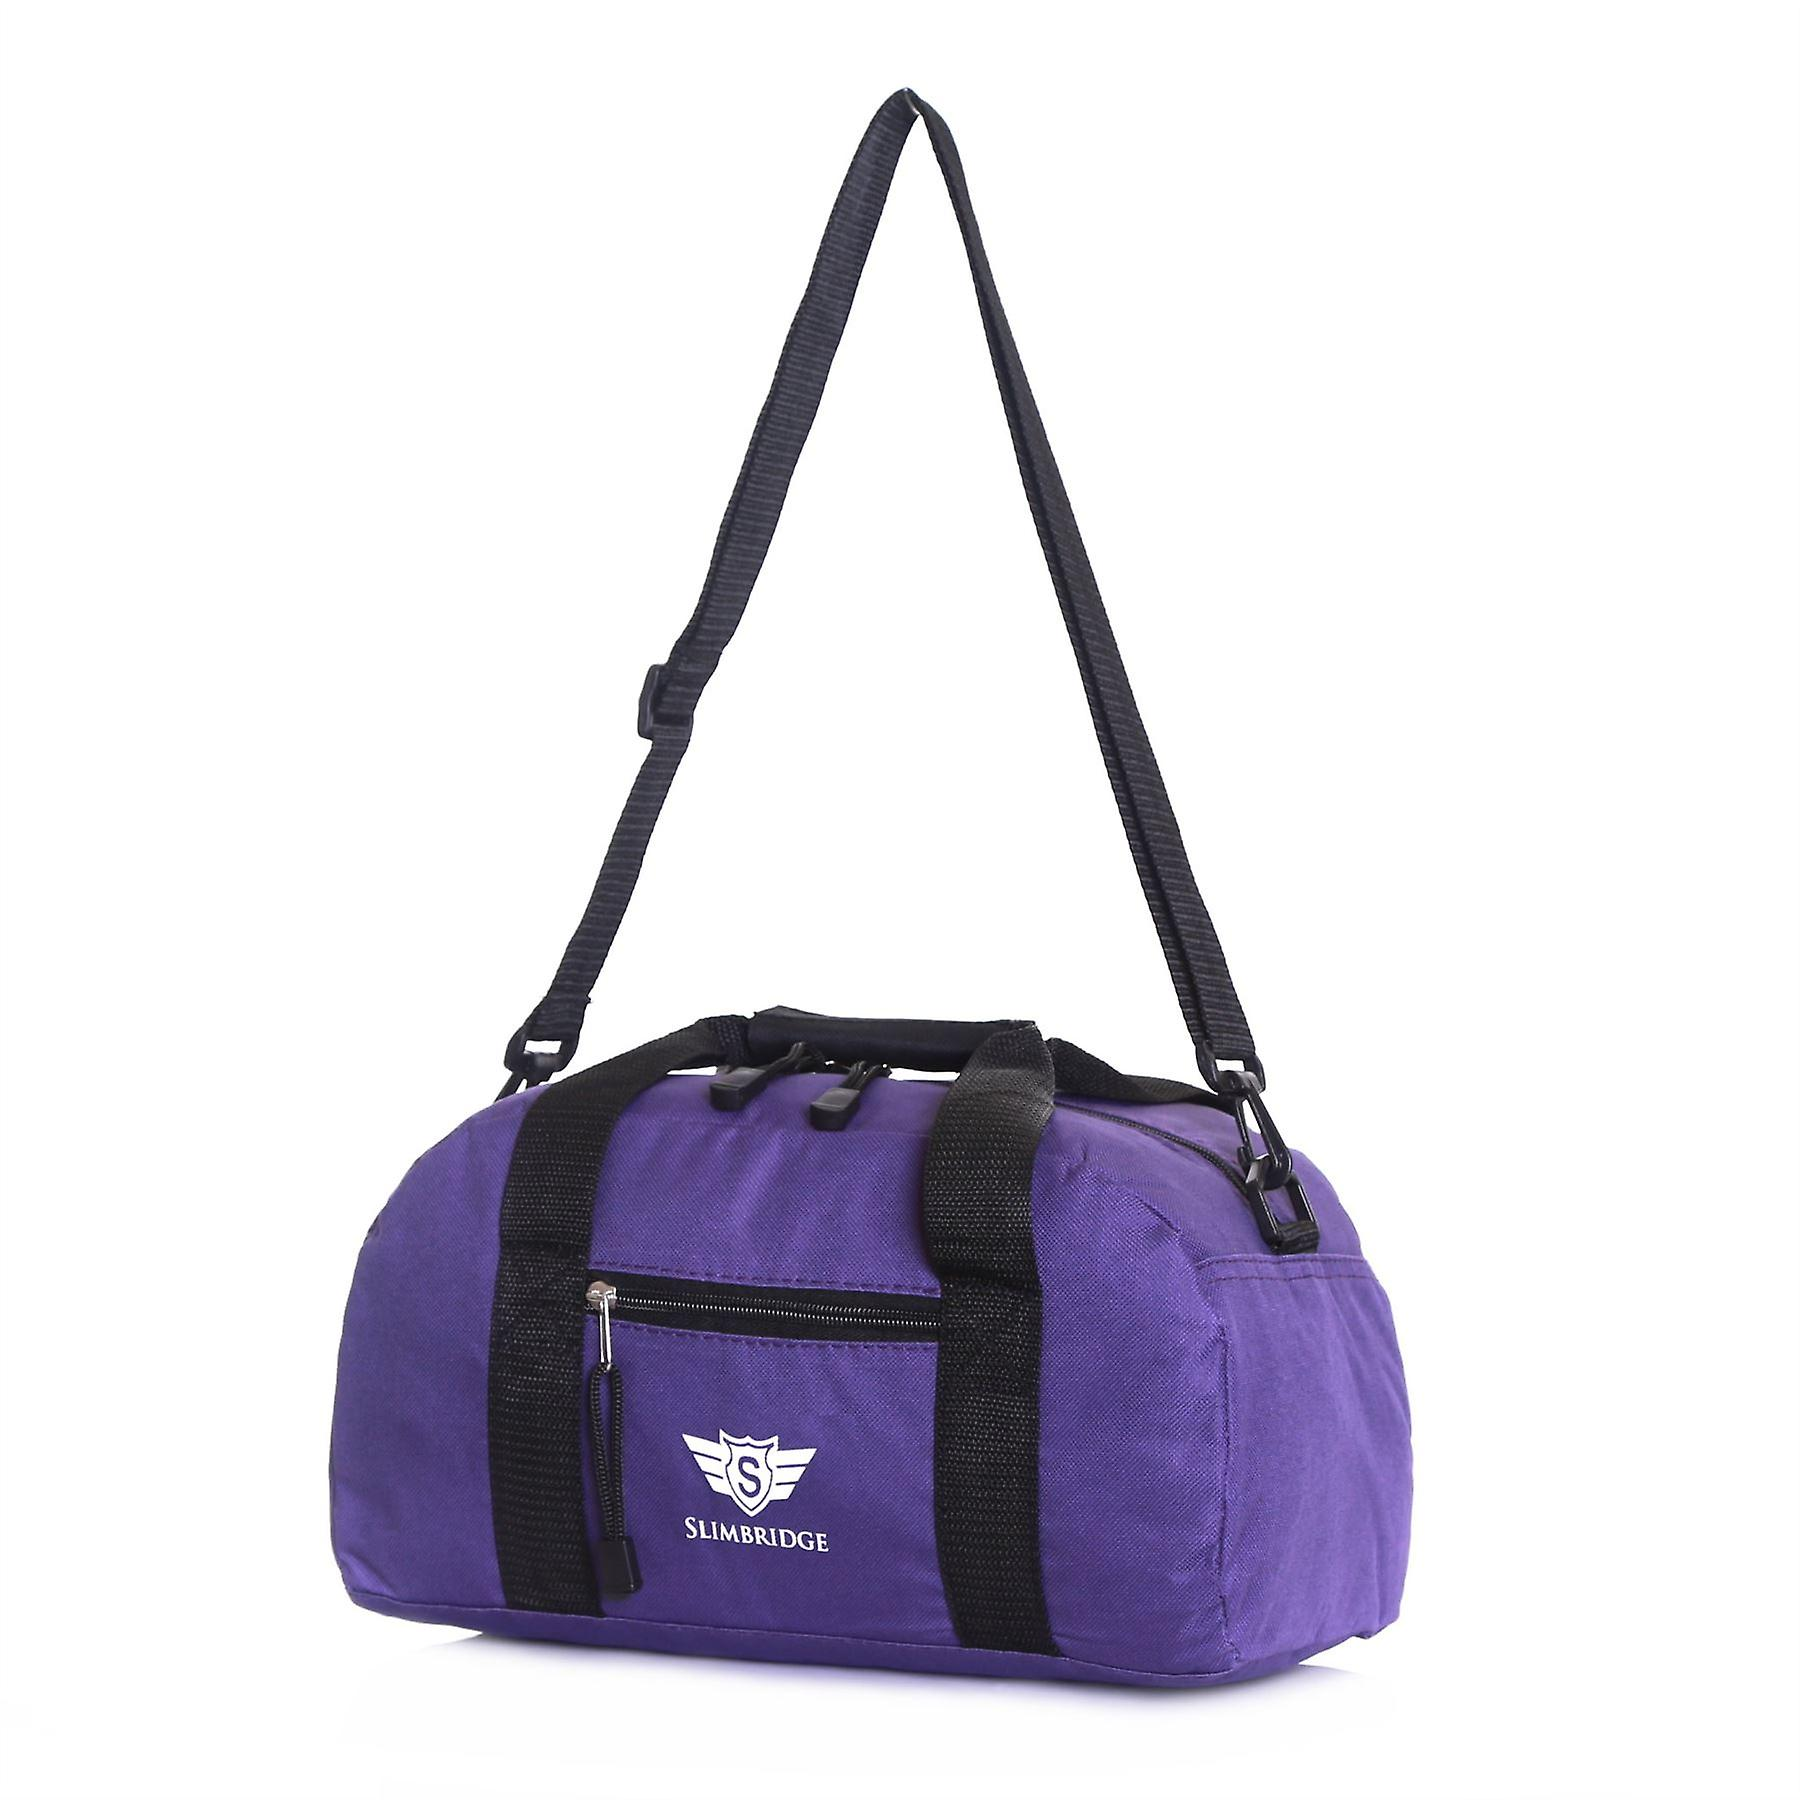 Slimbridge Elgin Small Ryanair Cabin Bag, Purple